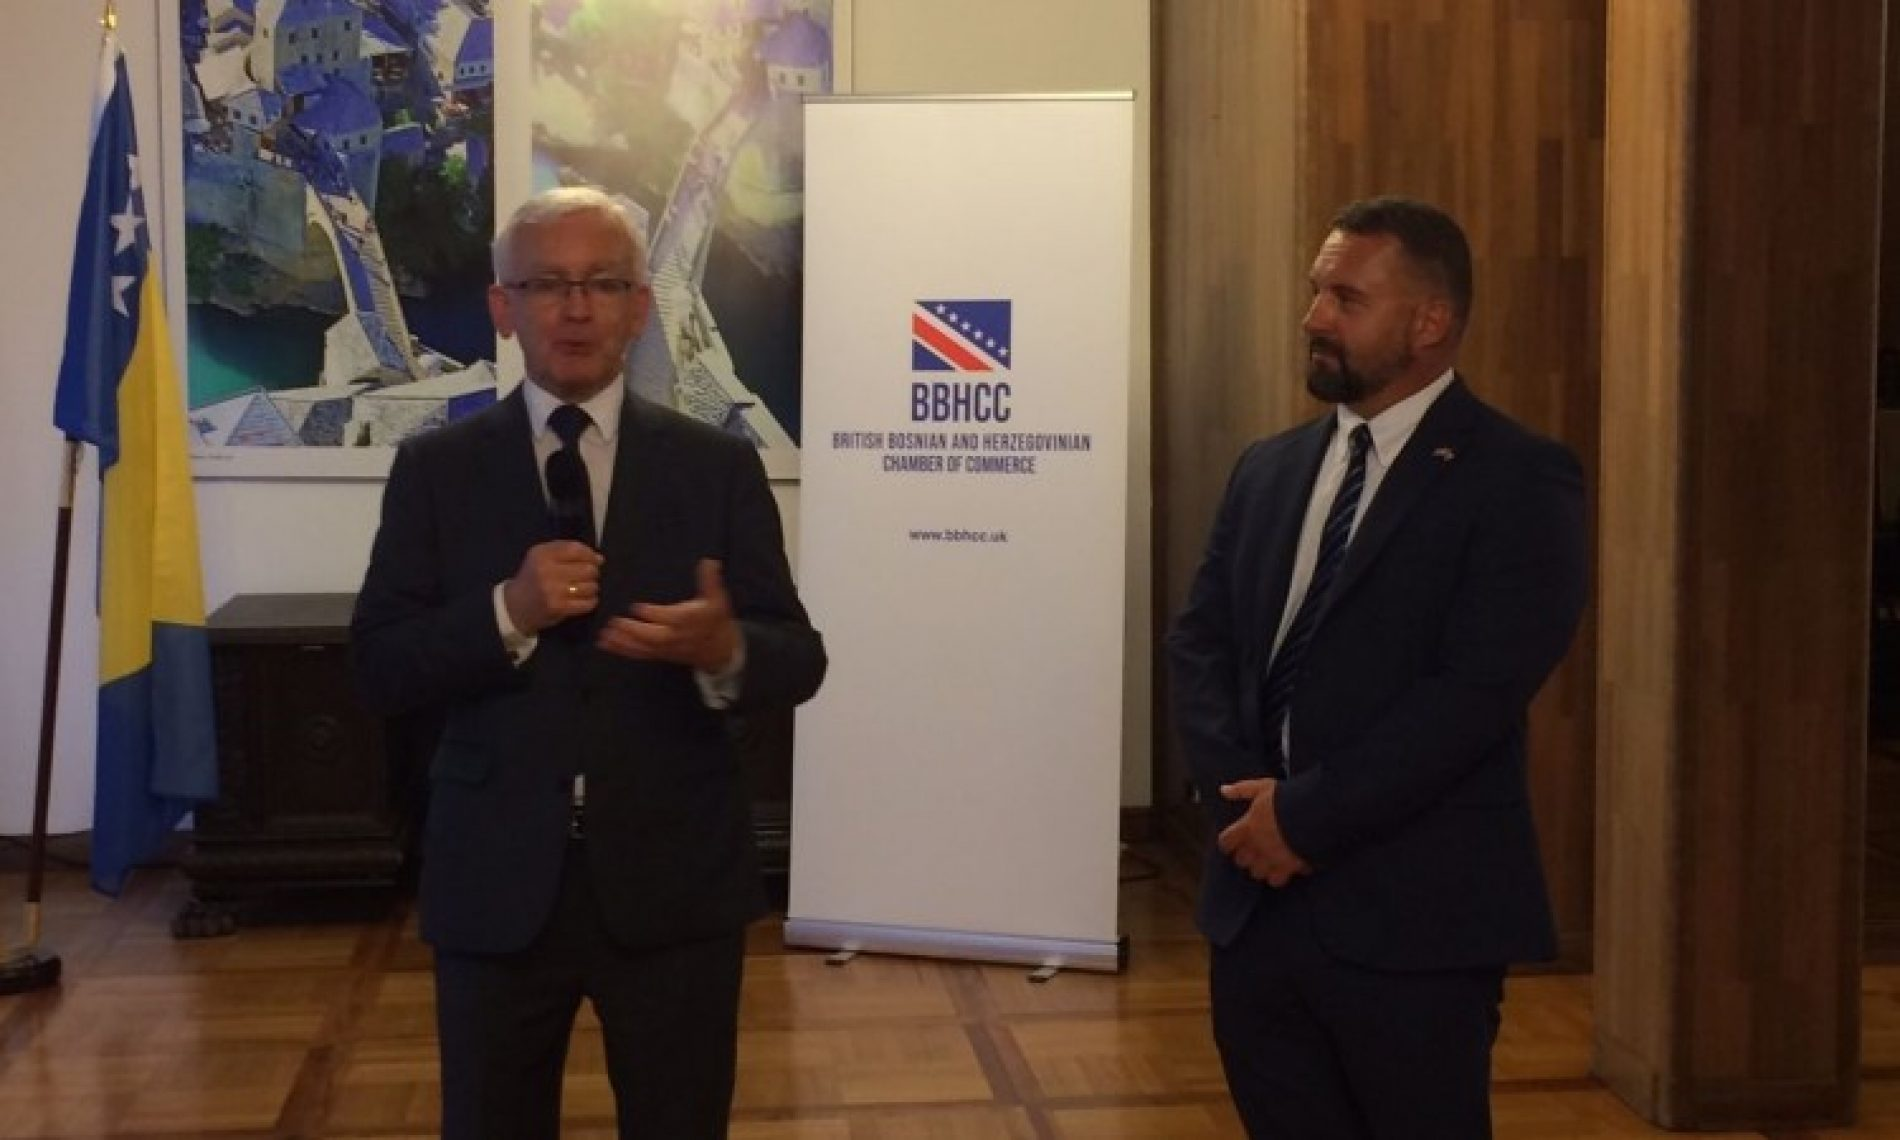 U Londonu promovirana Britansko-bosanskohercegovačka privredna komora